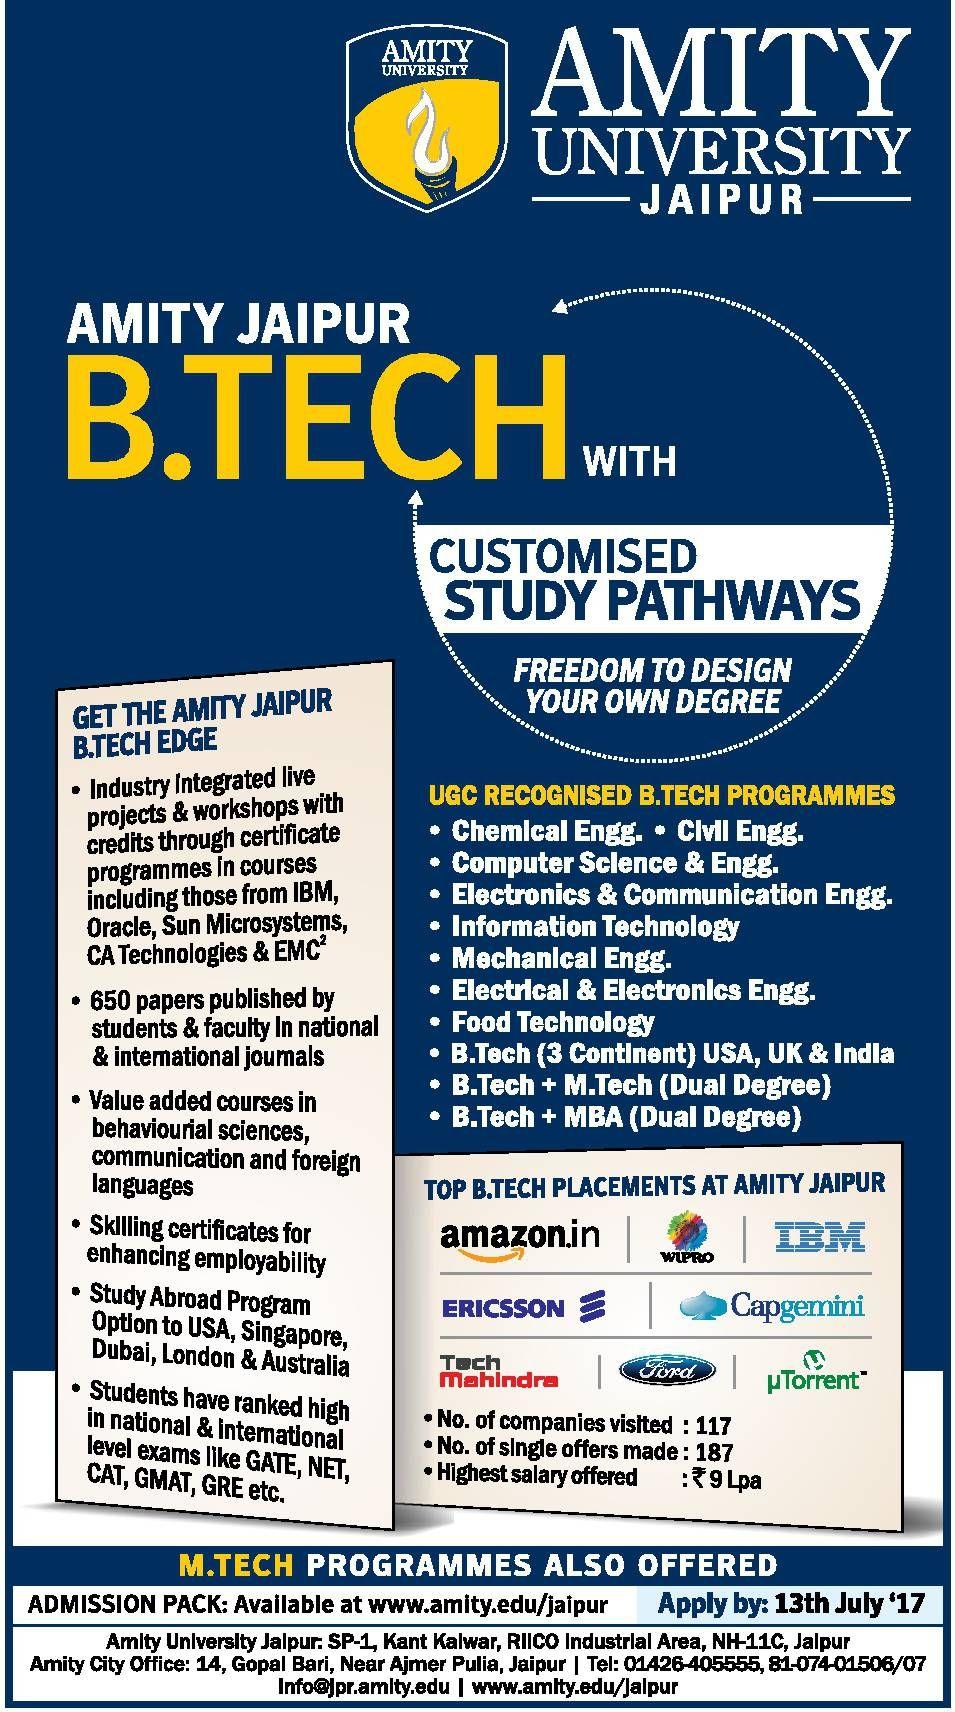 Amity University Jaipur Get The Amity Jaipur Btech Edge Ad With